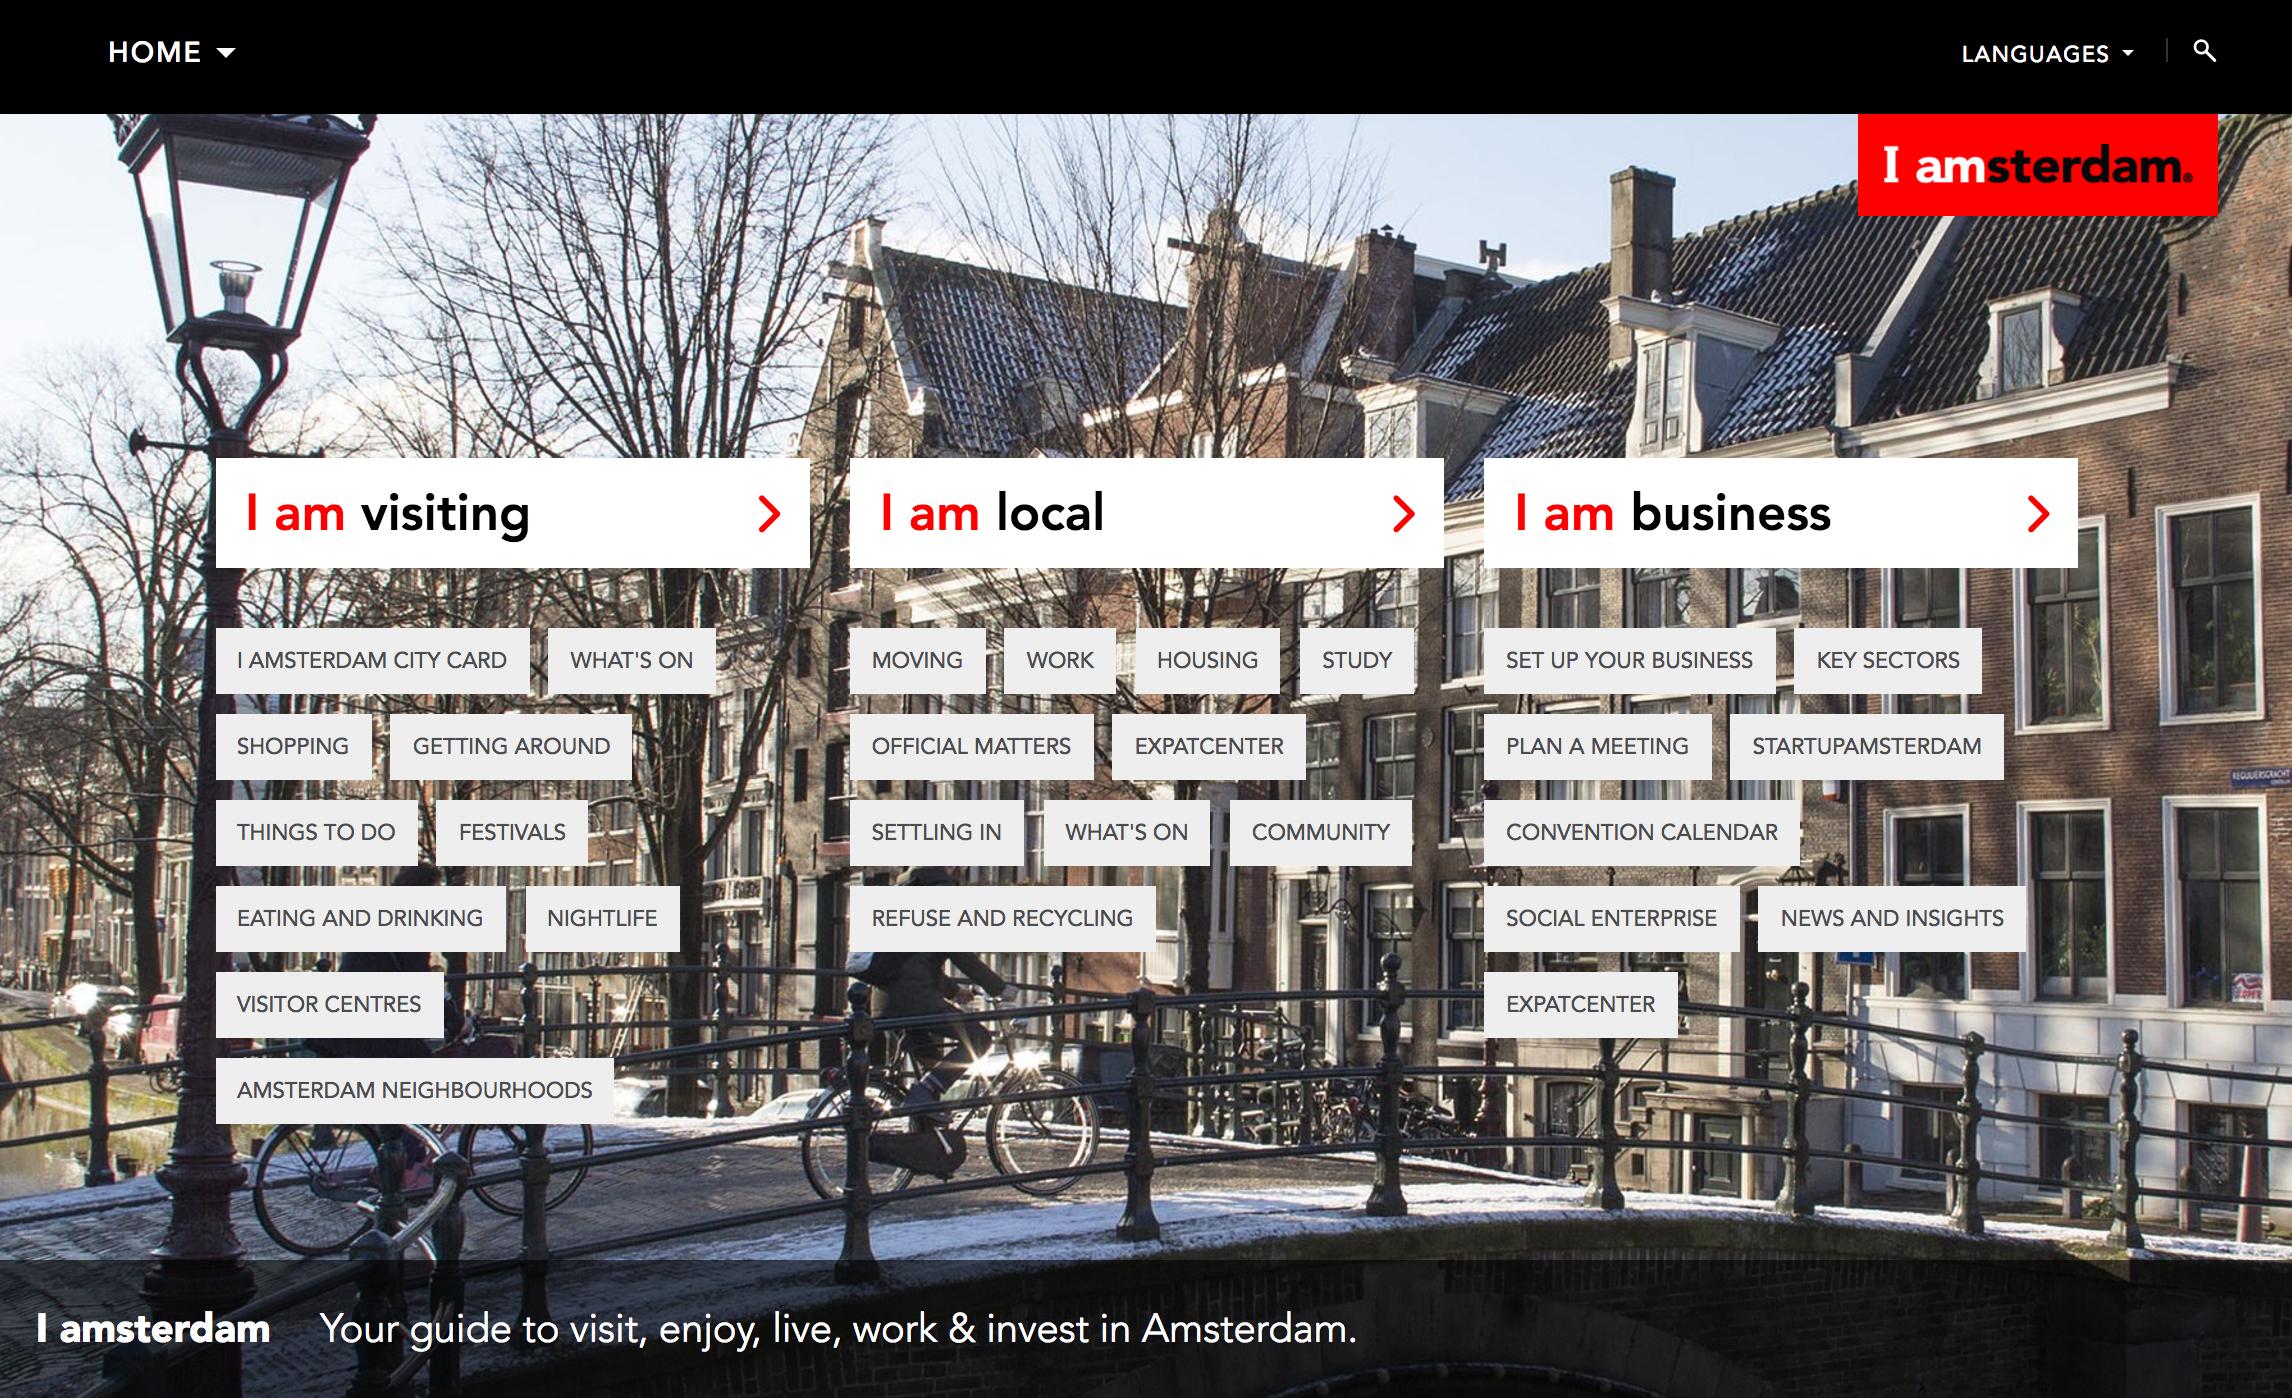 Amsterdam City Branding - Glasgow City Branding - Place Branding Example